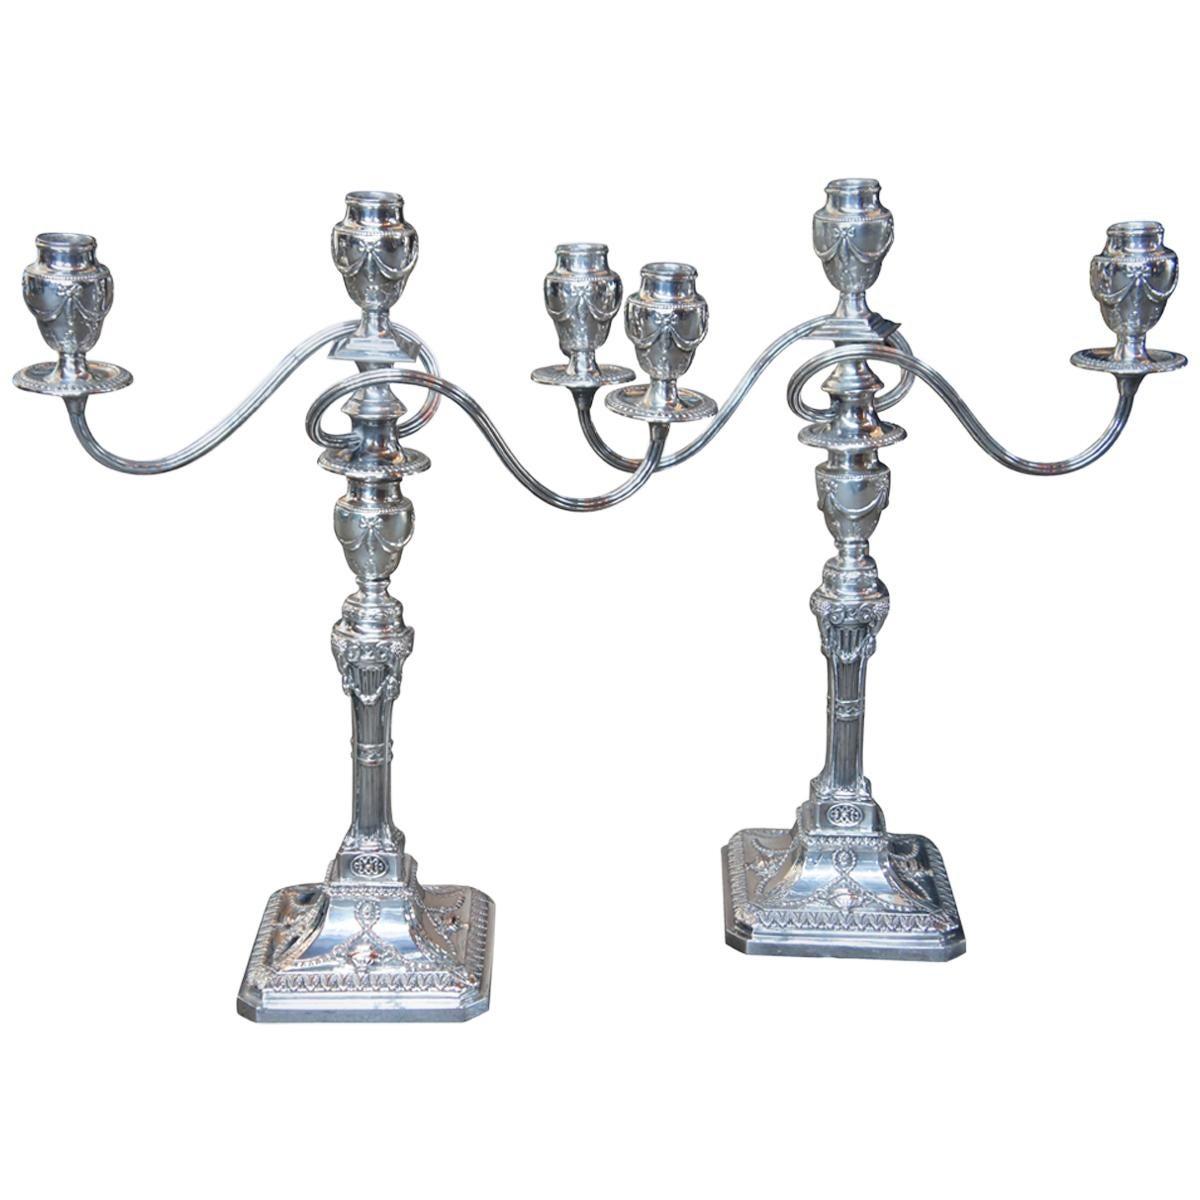 Antique Georgian Silver Plate Candelabra English Candlesticks Rams Head MS Rau